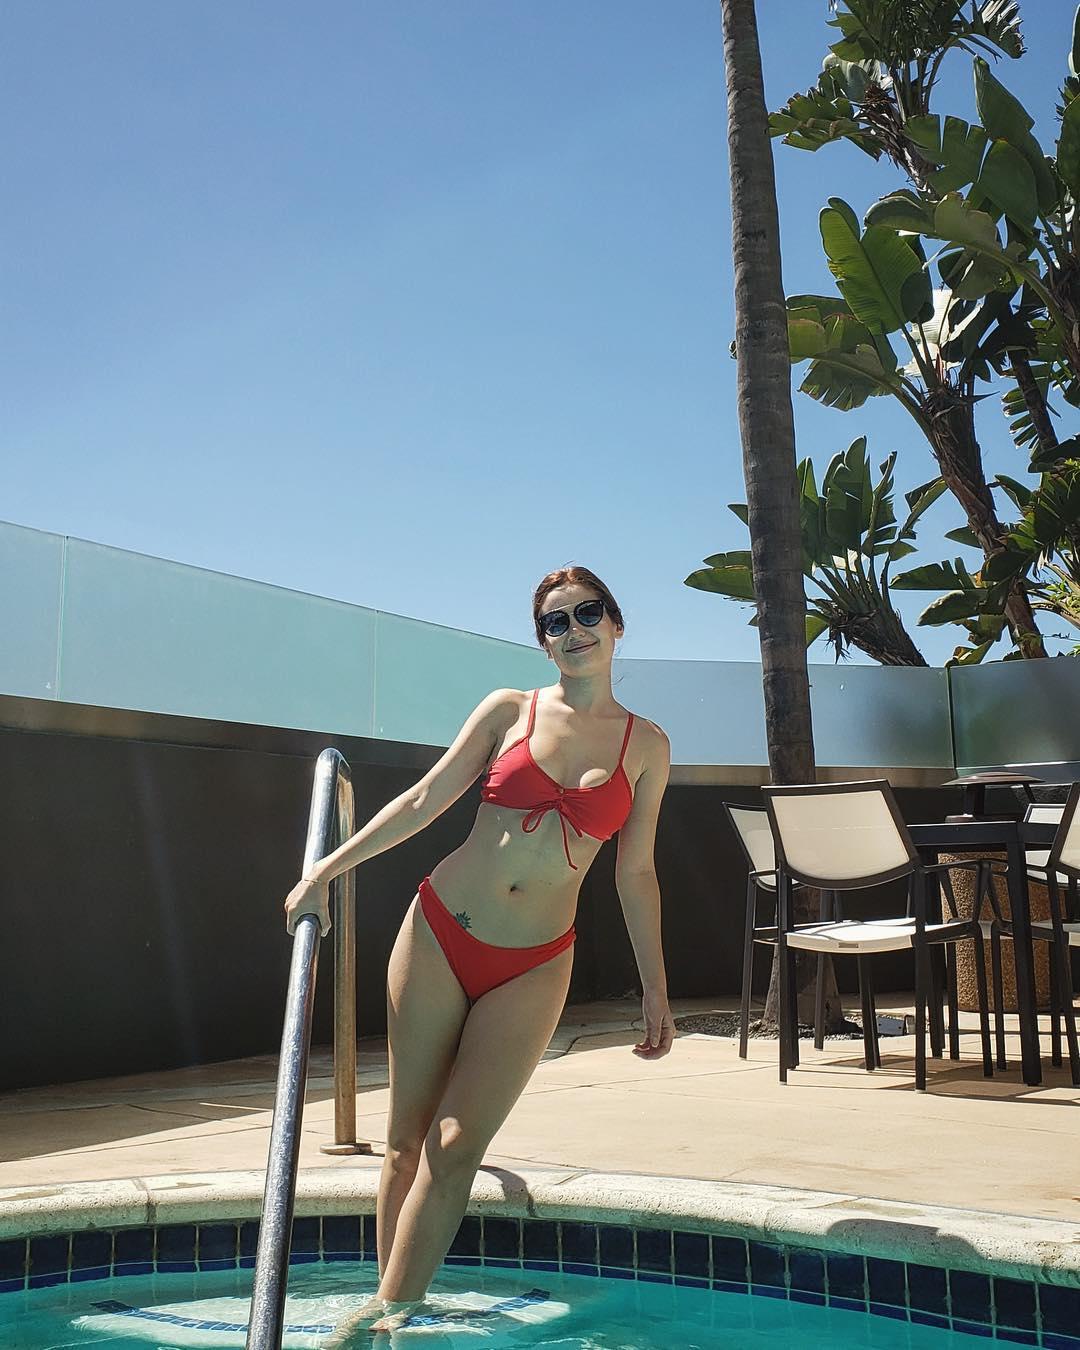 Bikini Ivana Baquero